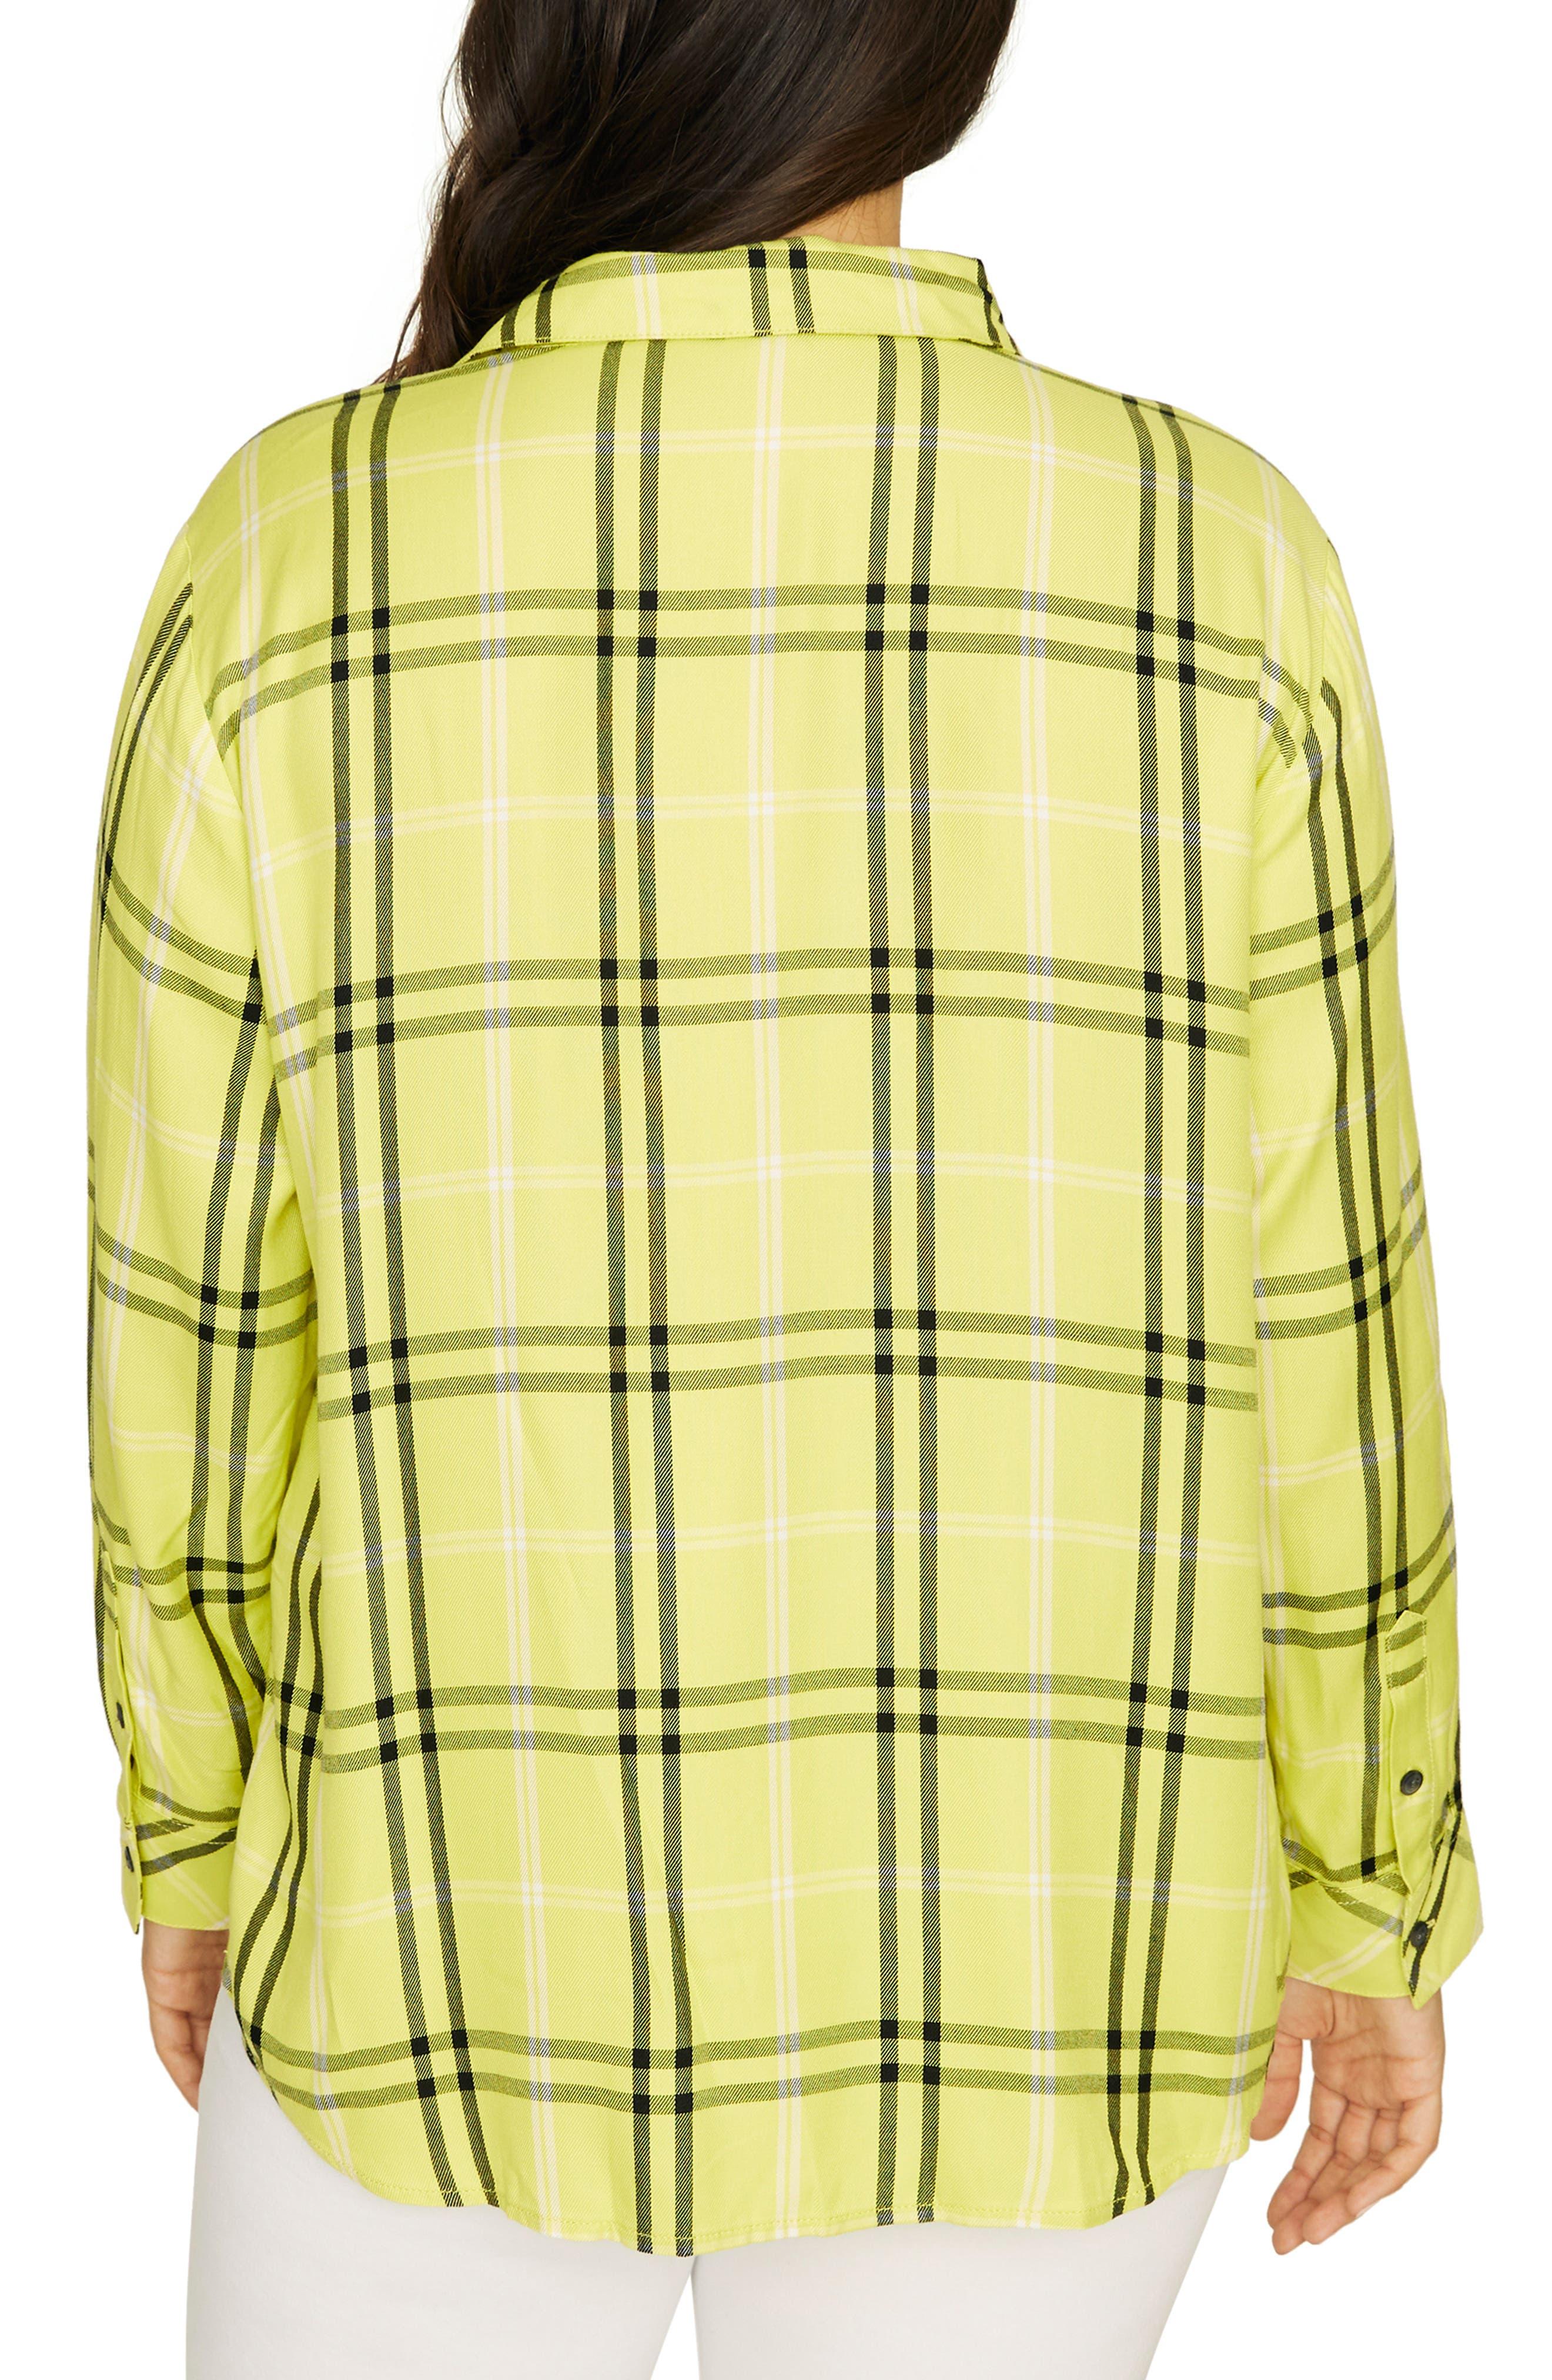 SANCTUARY, Boyfriend for Life Oversize Check Shirt, Alternate thumbnail 2, color, 700